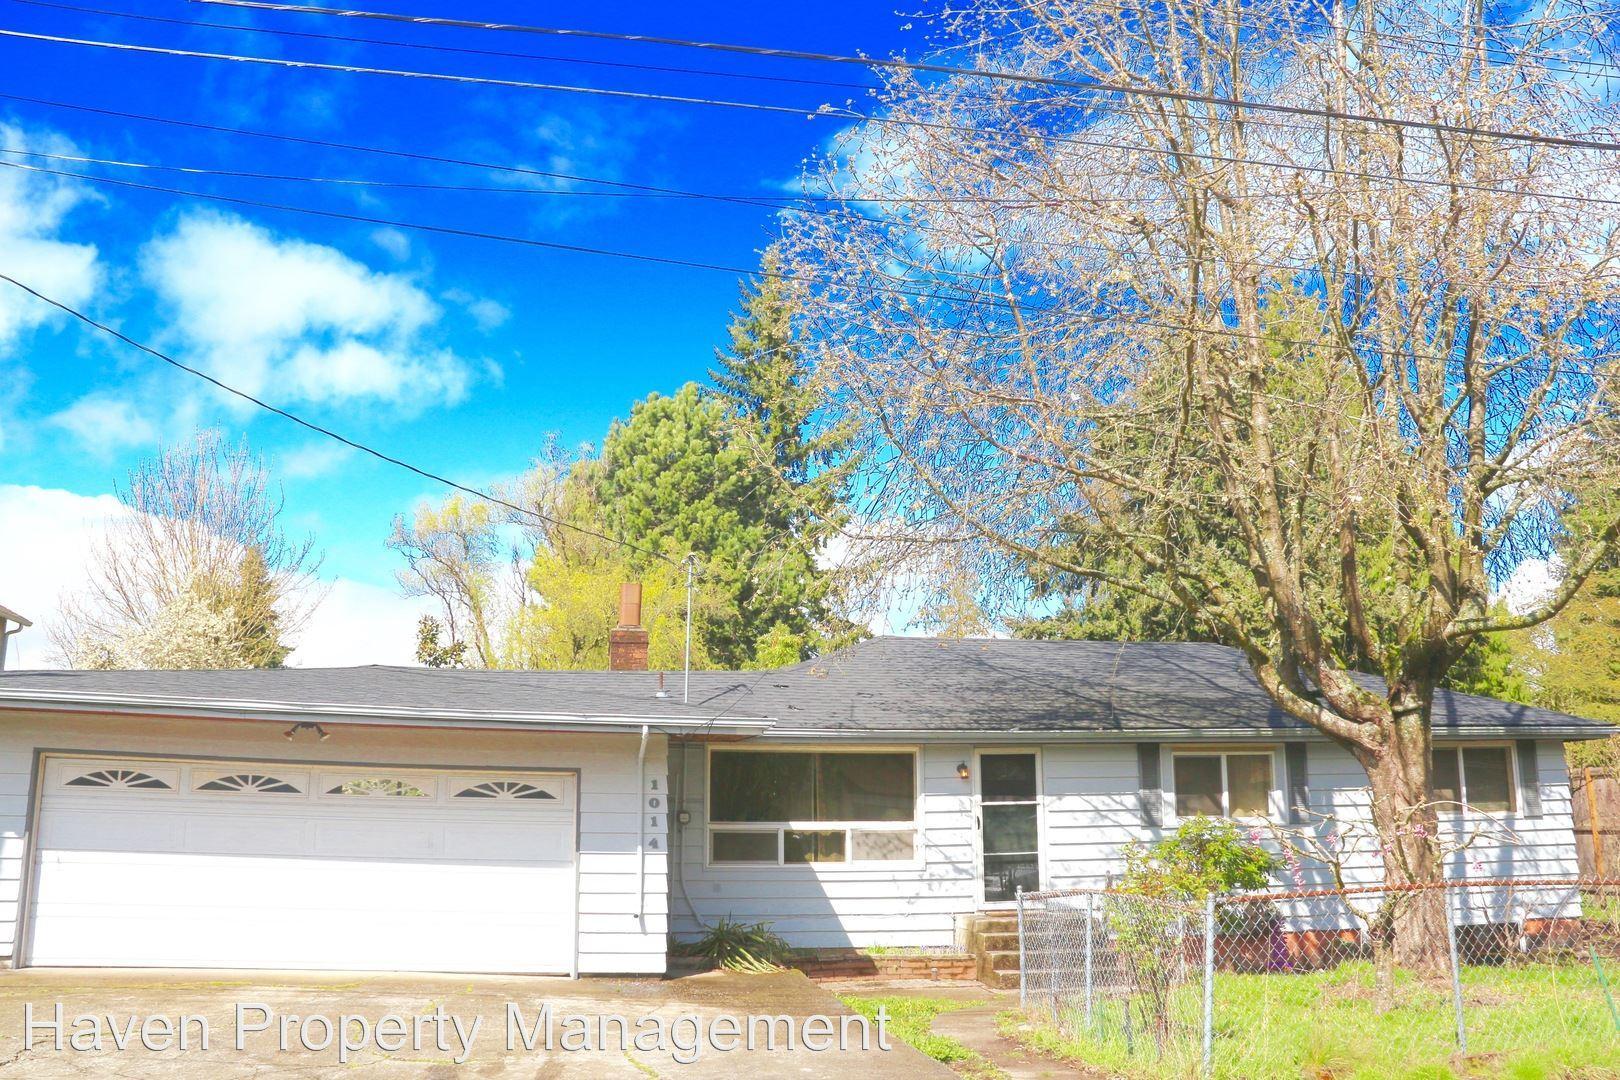 1014 S 115th St, Seattle, WA 98168 For Rent | Trulia